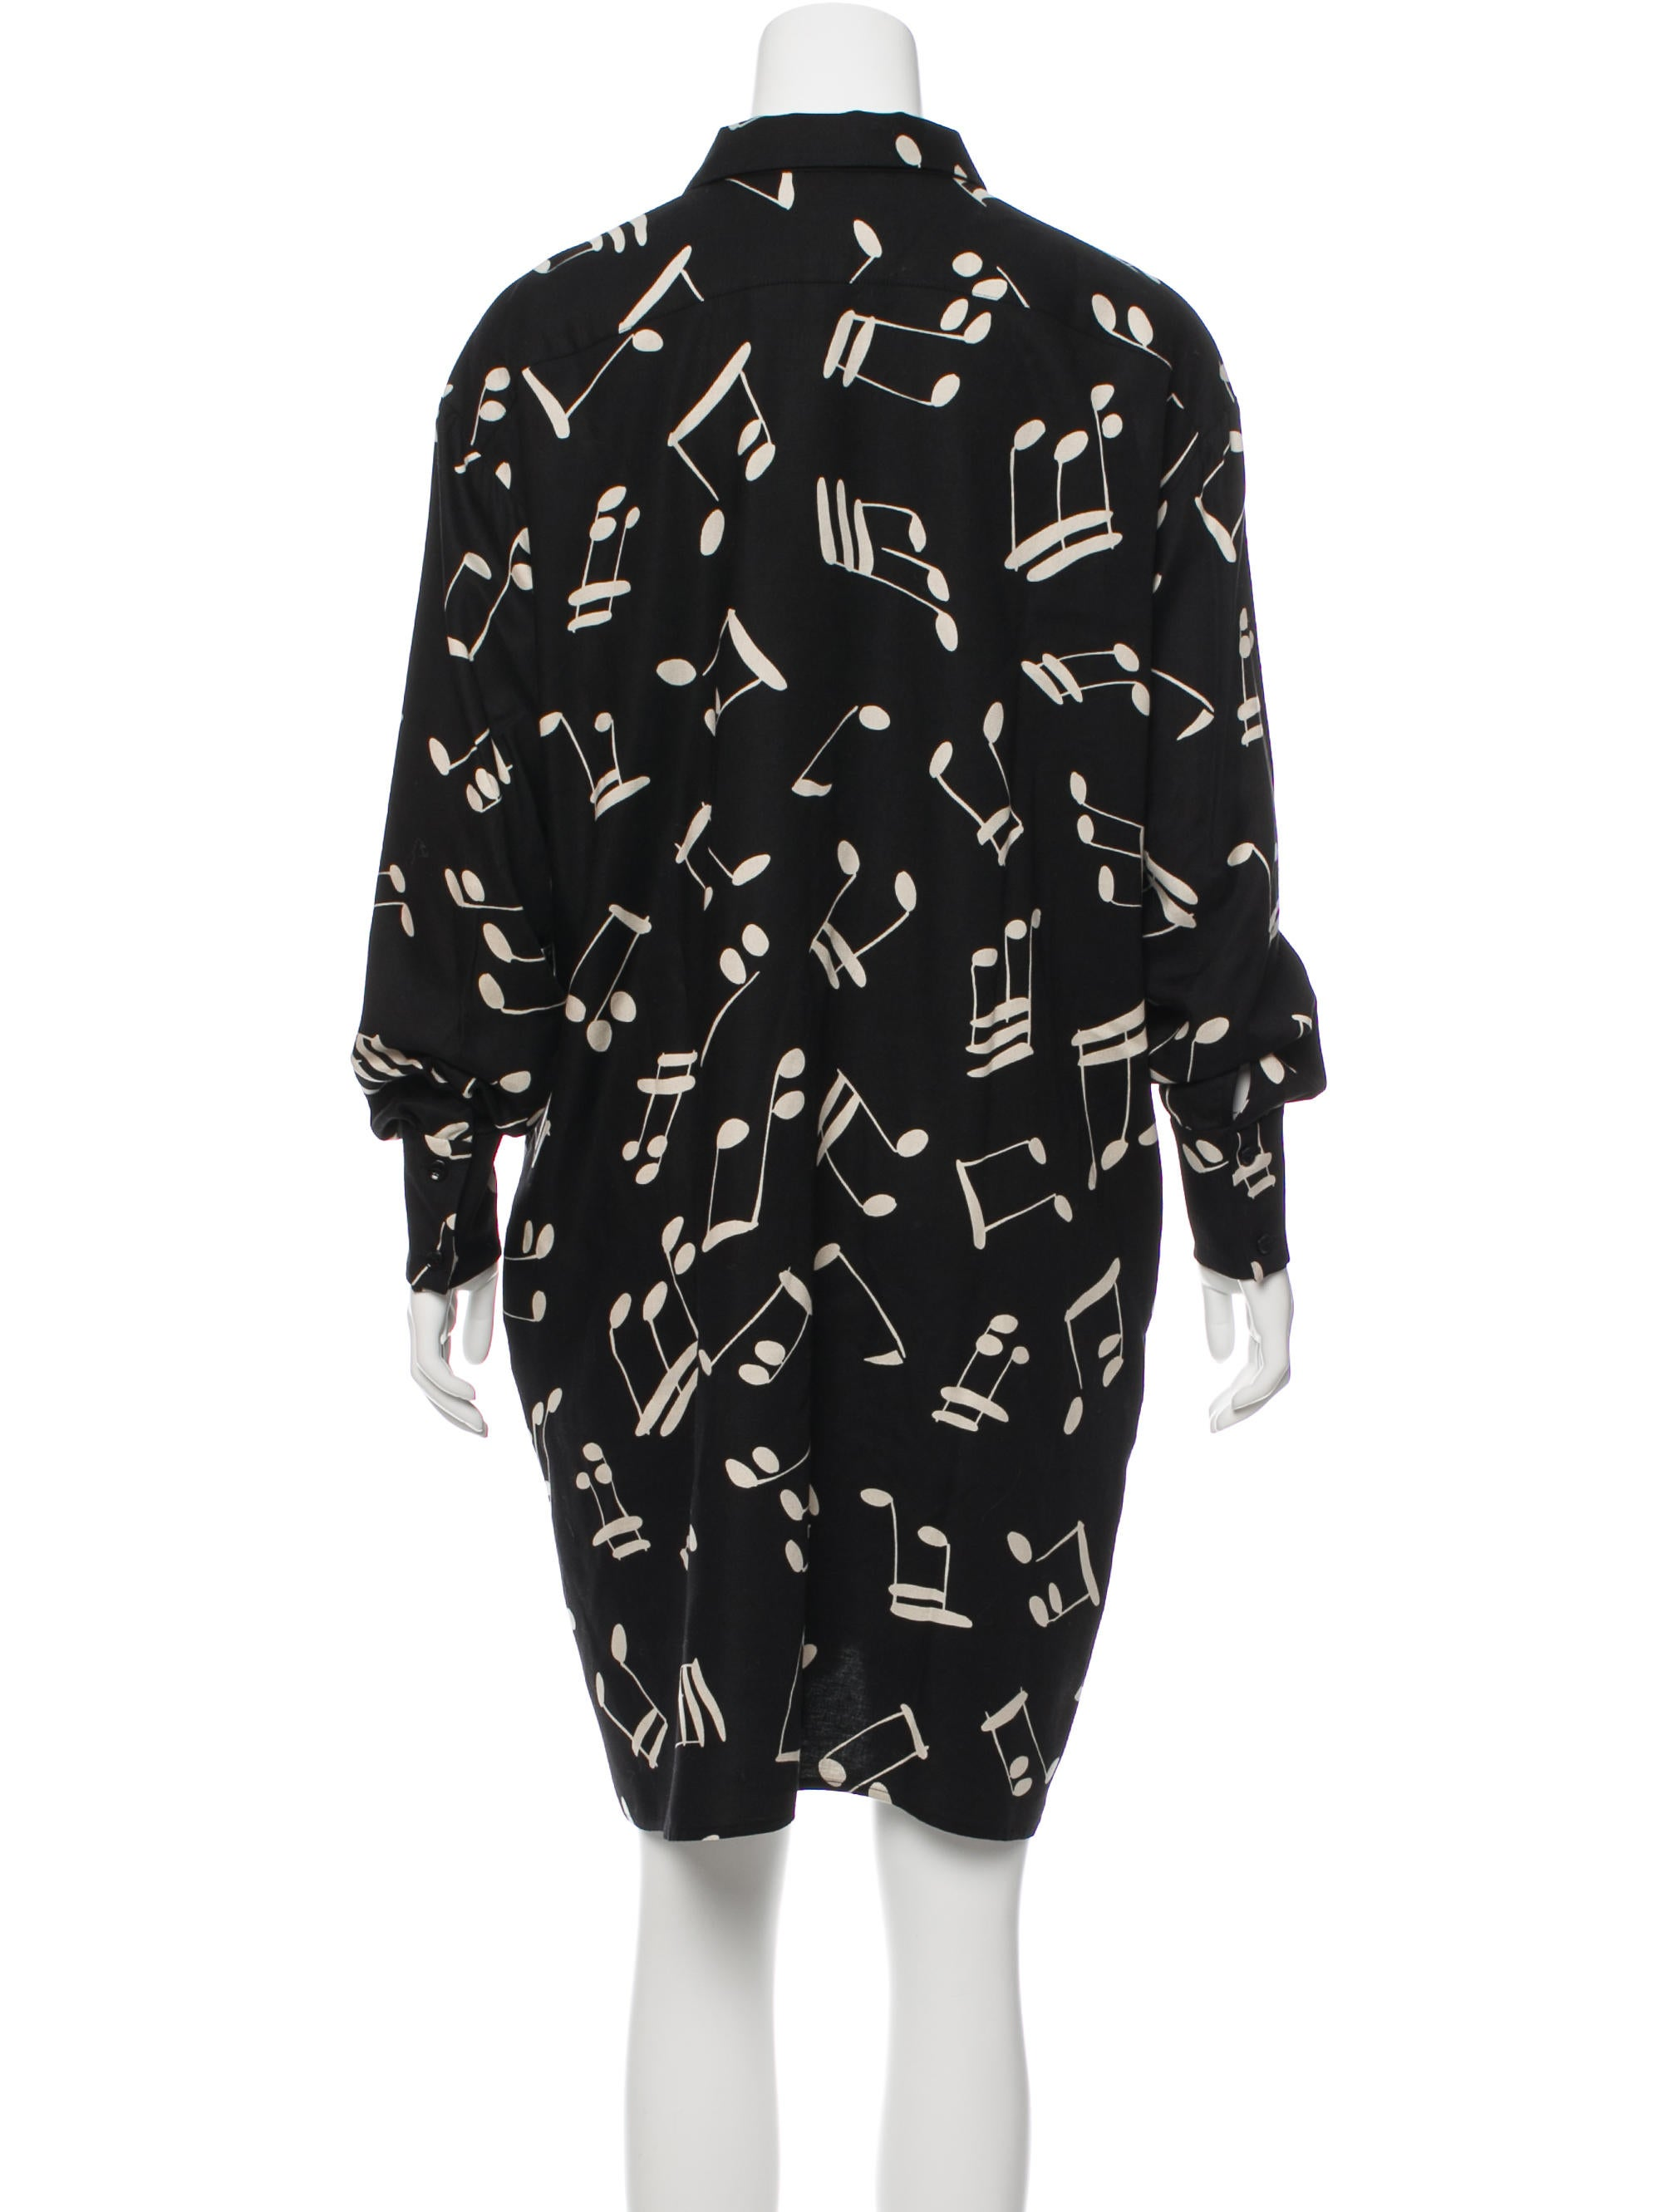 Saint laurent music note print shirt dress clothing for Saint laurent shirt womens